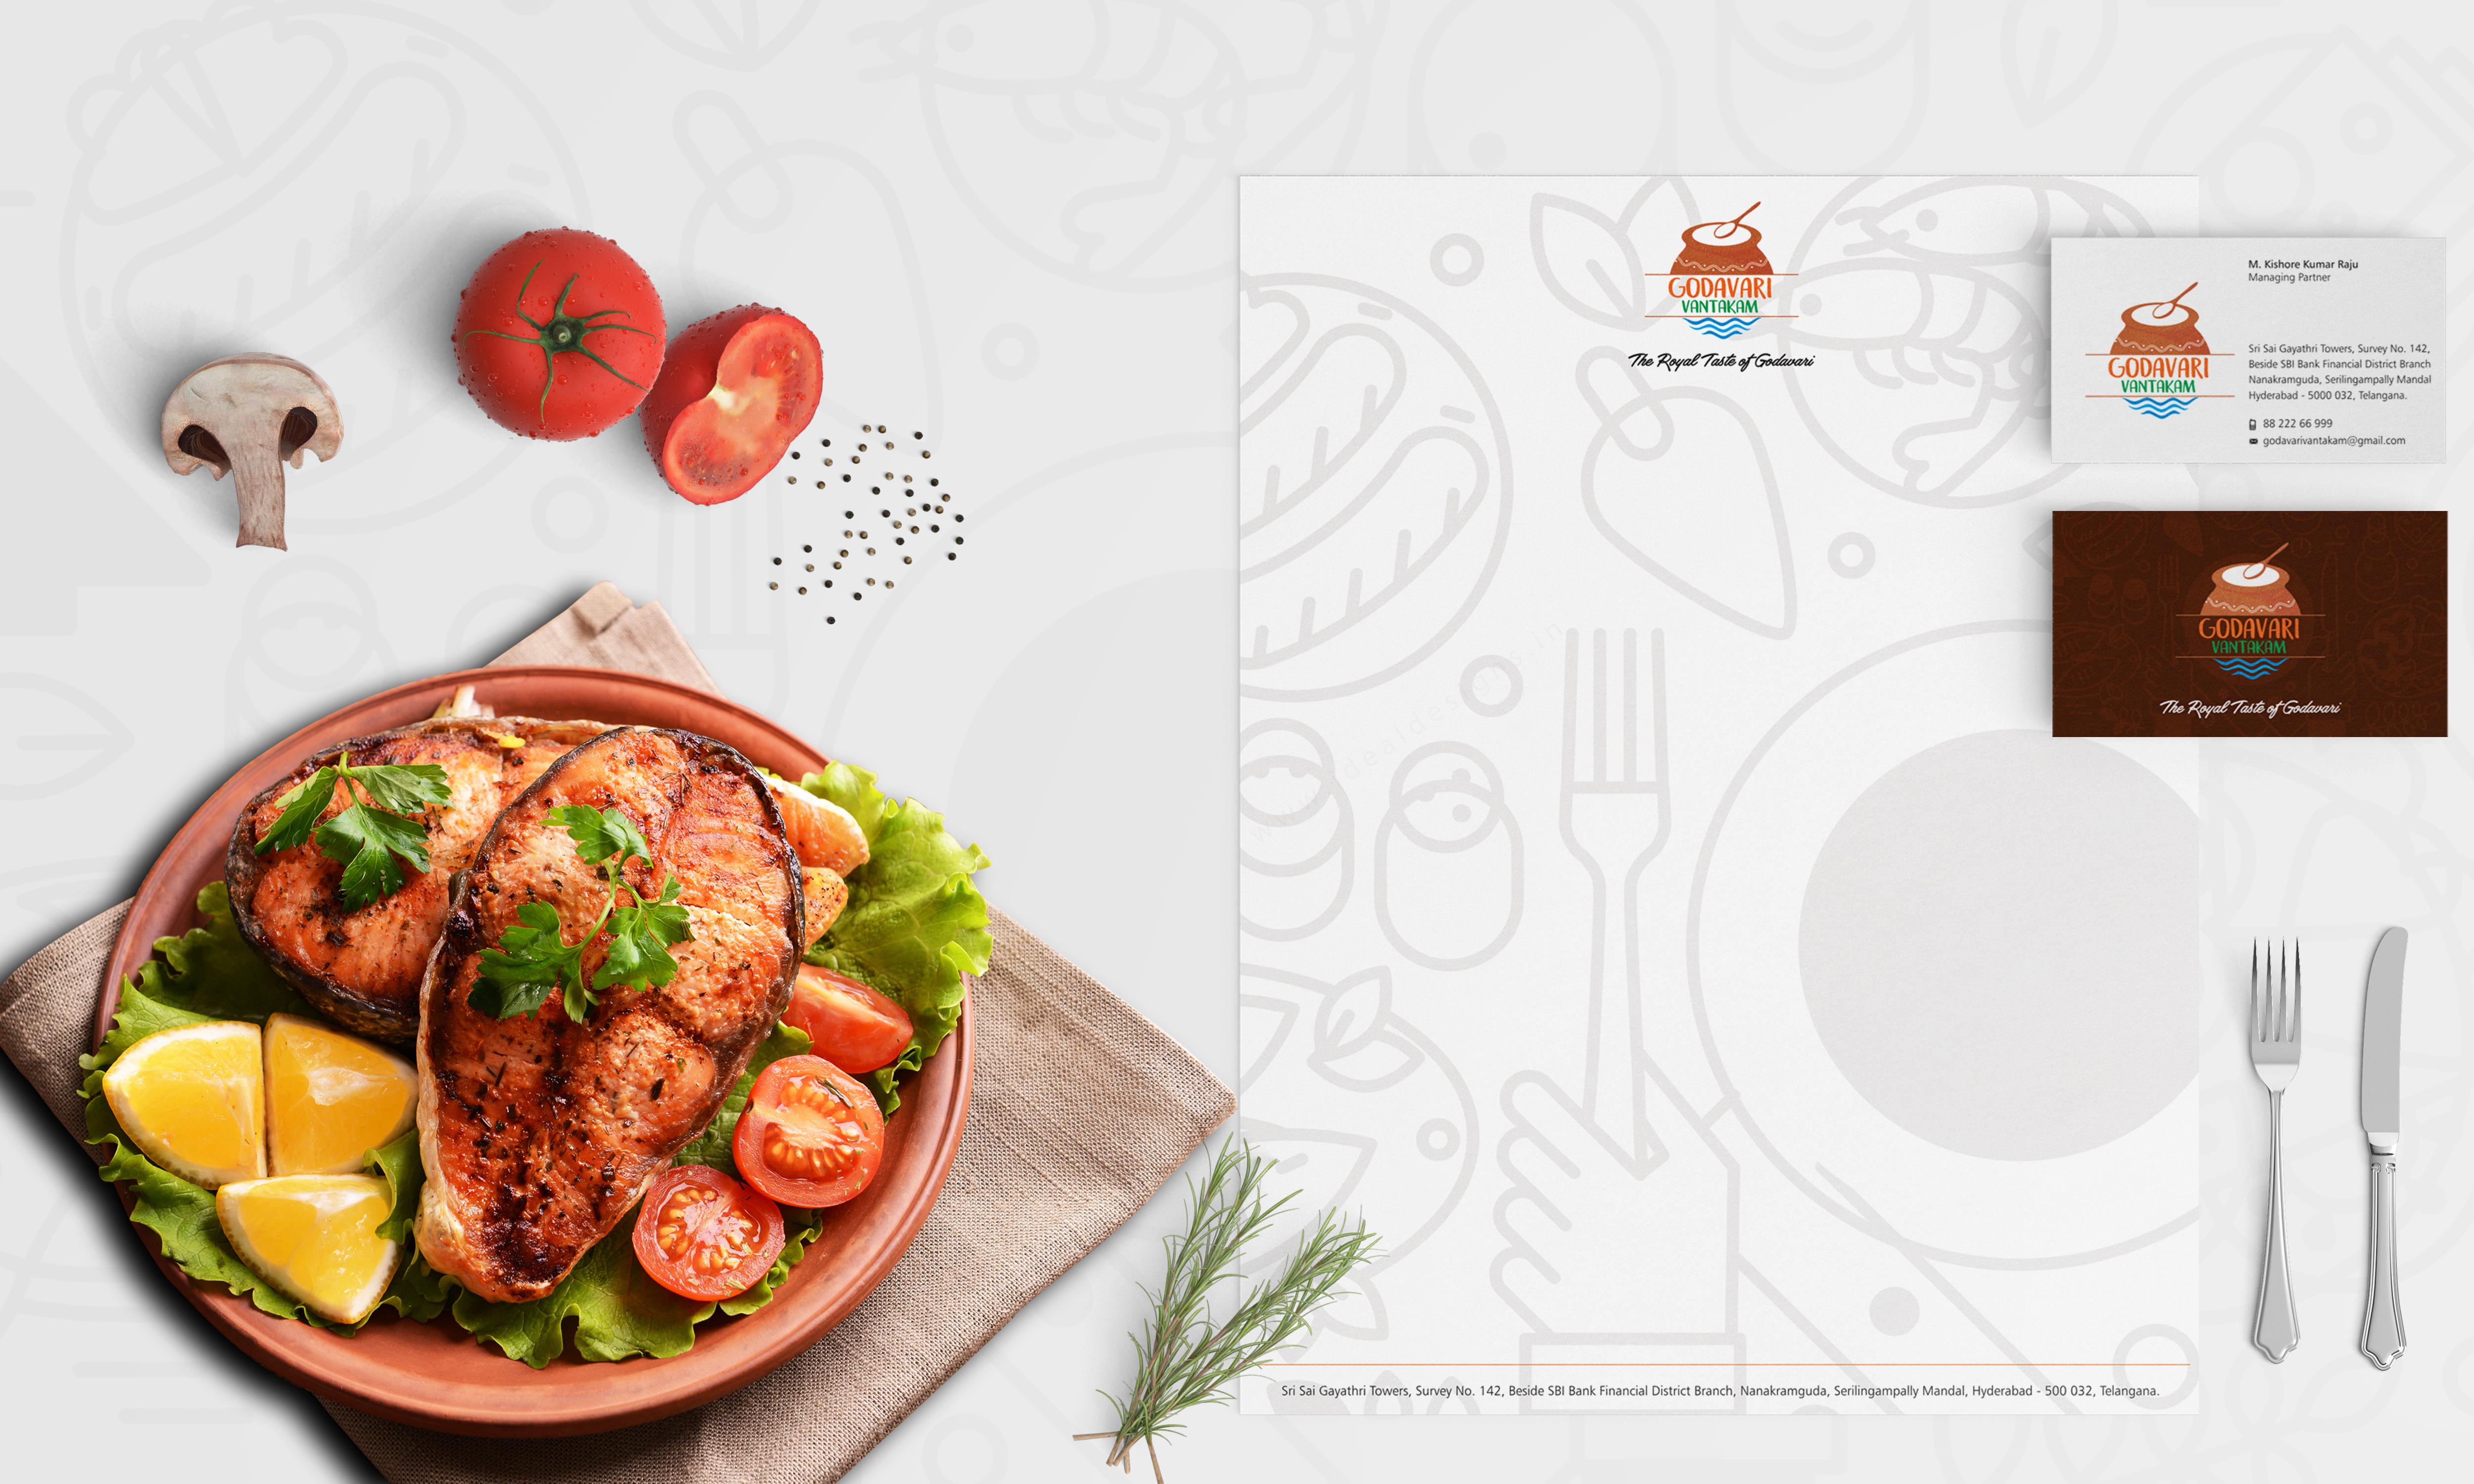 godavari restaurant food iterm 2